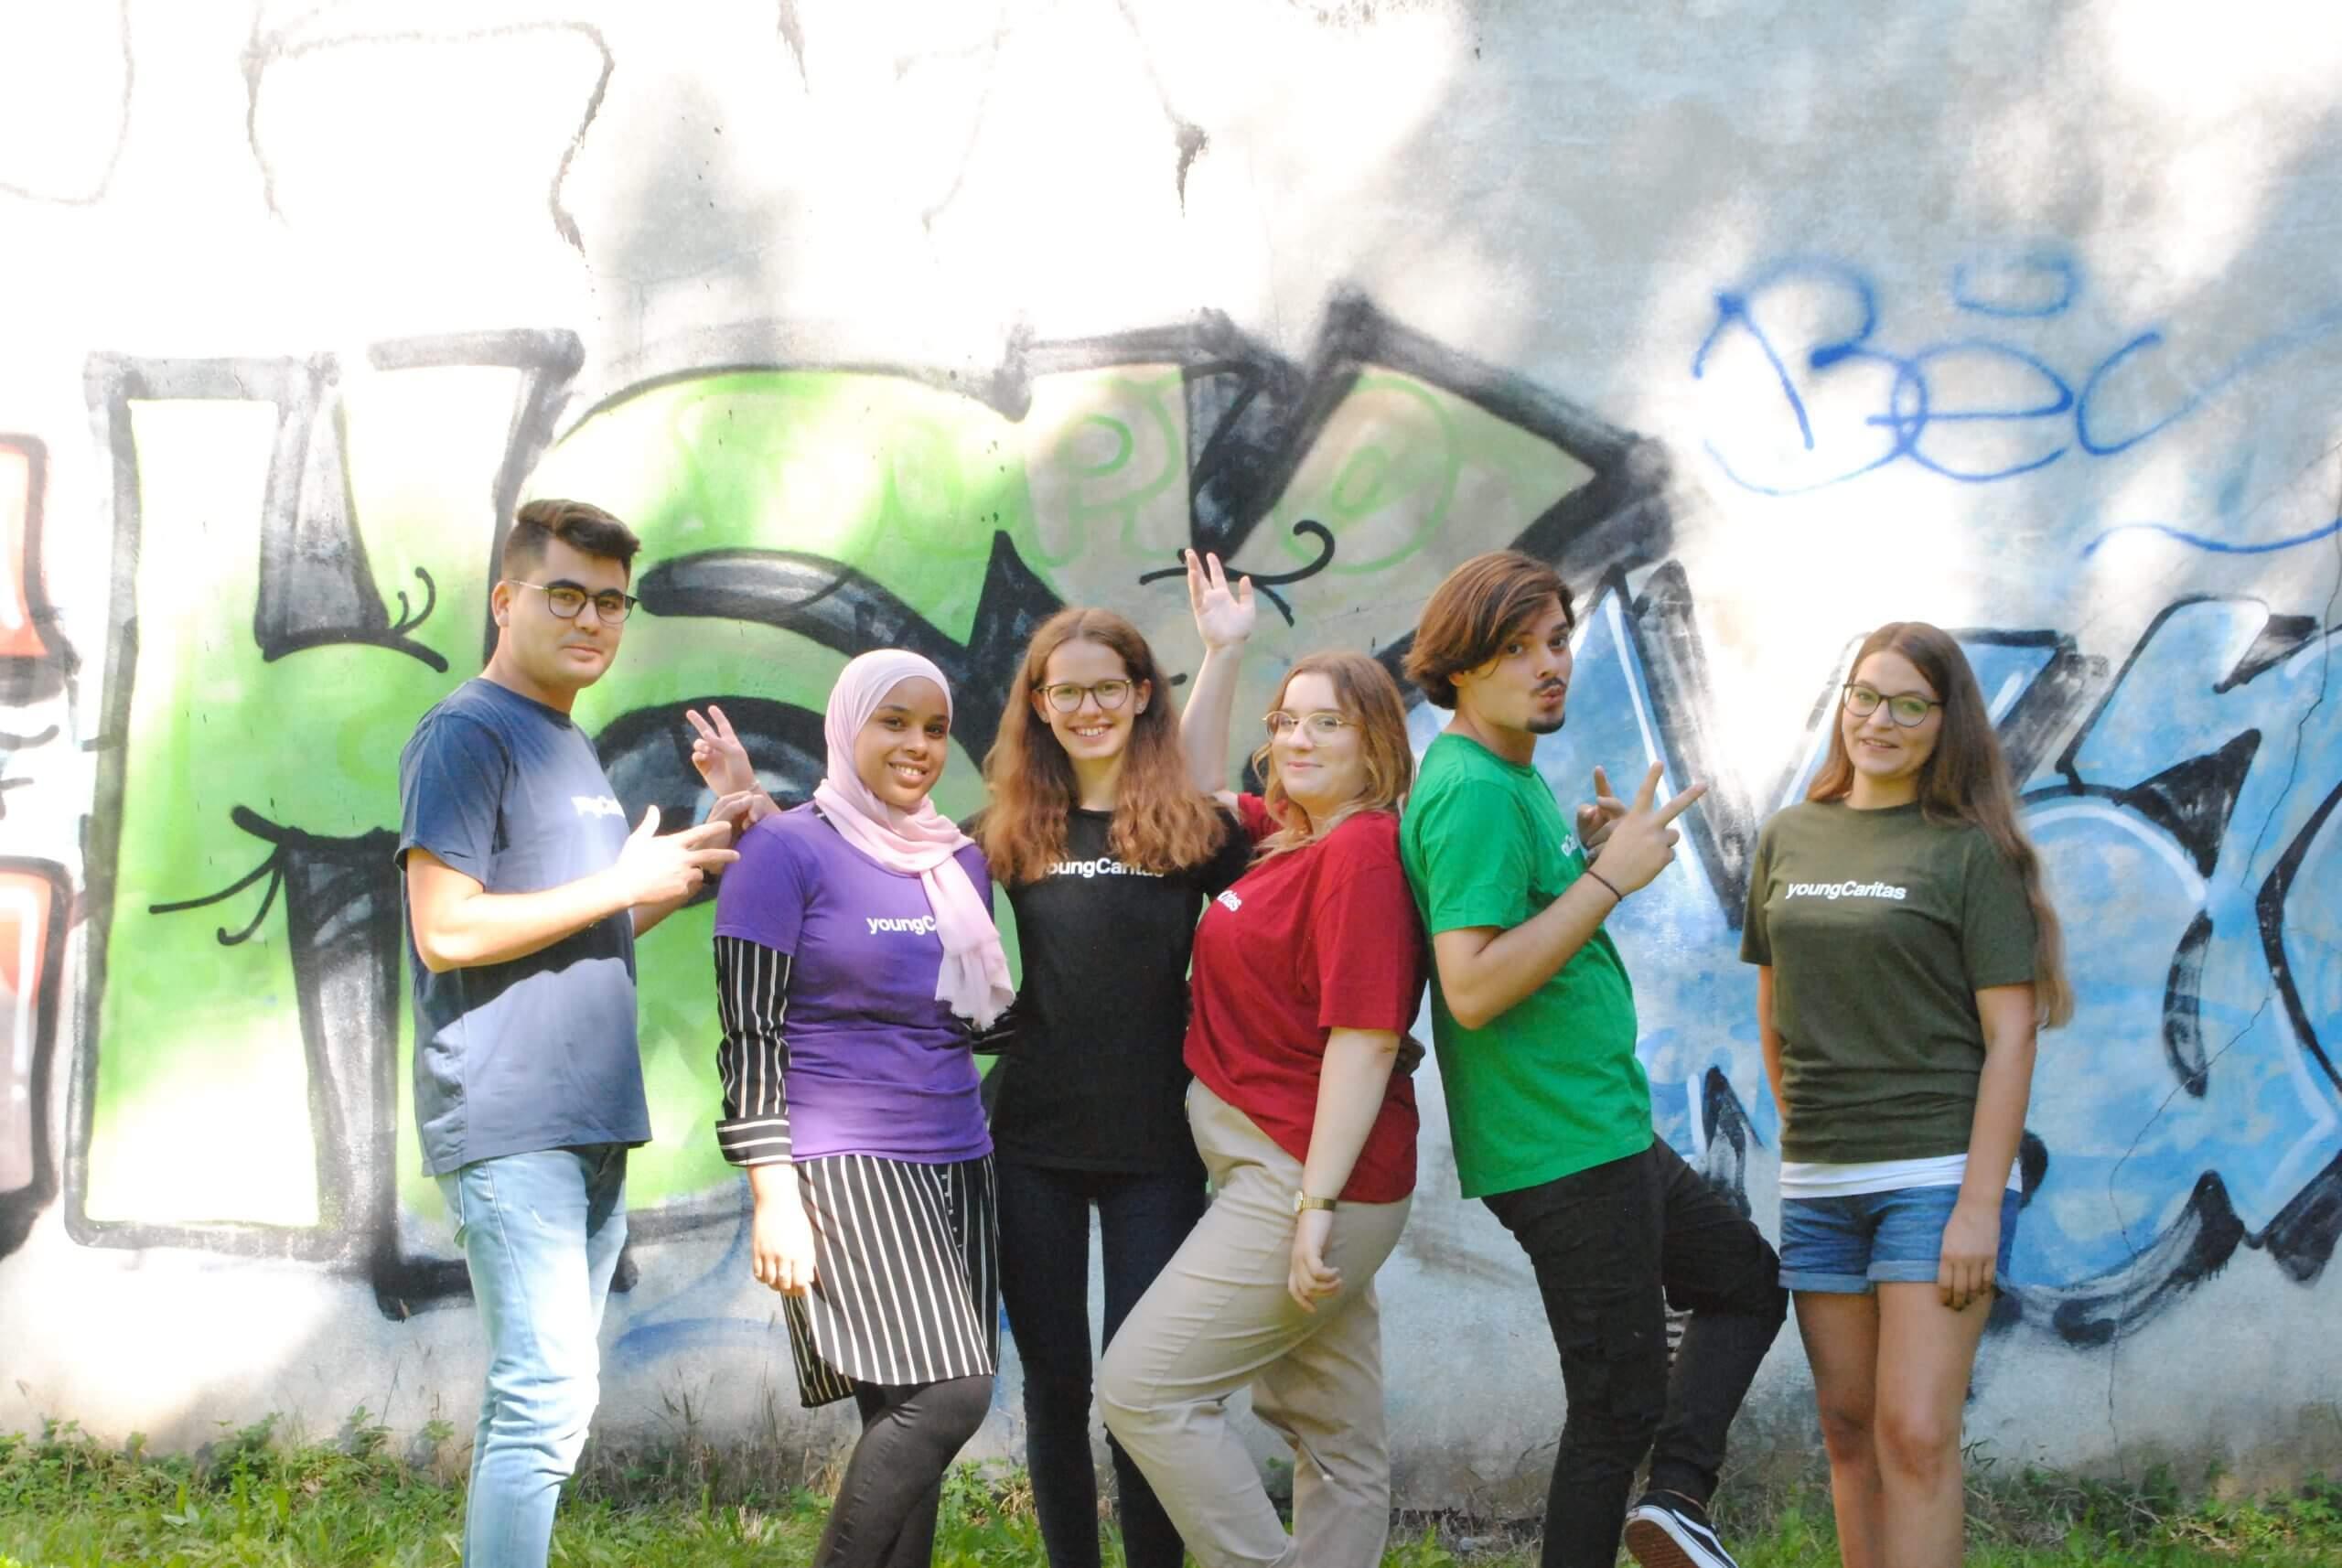 actionPooler*innen vor Graffiti